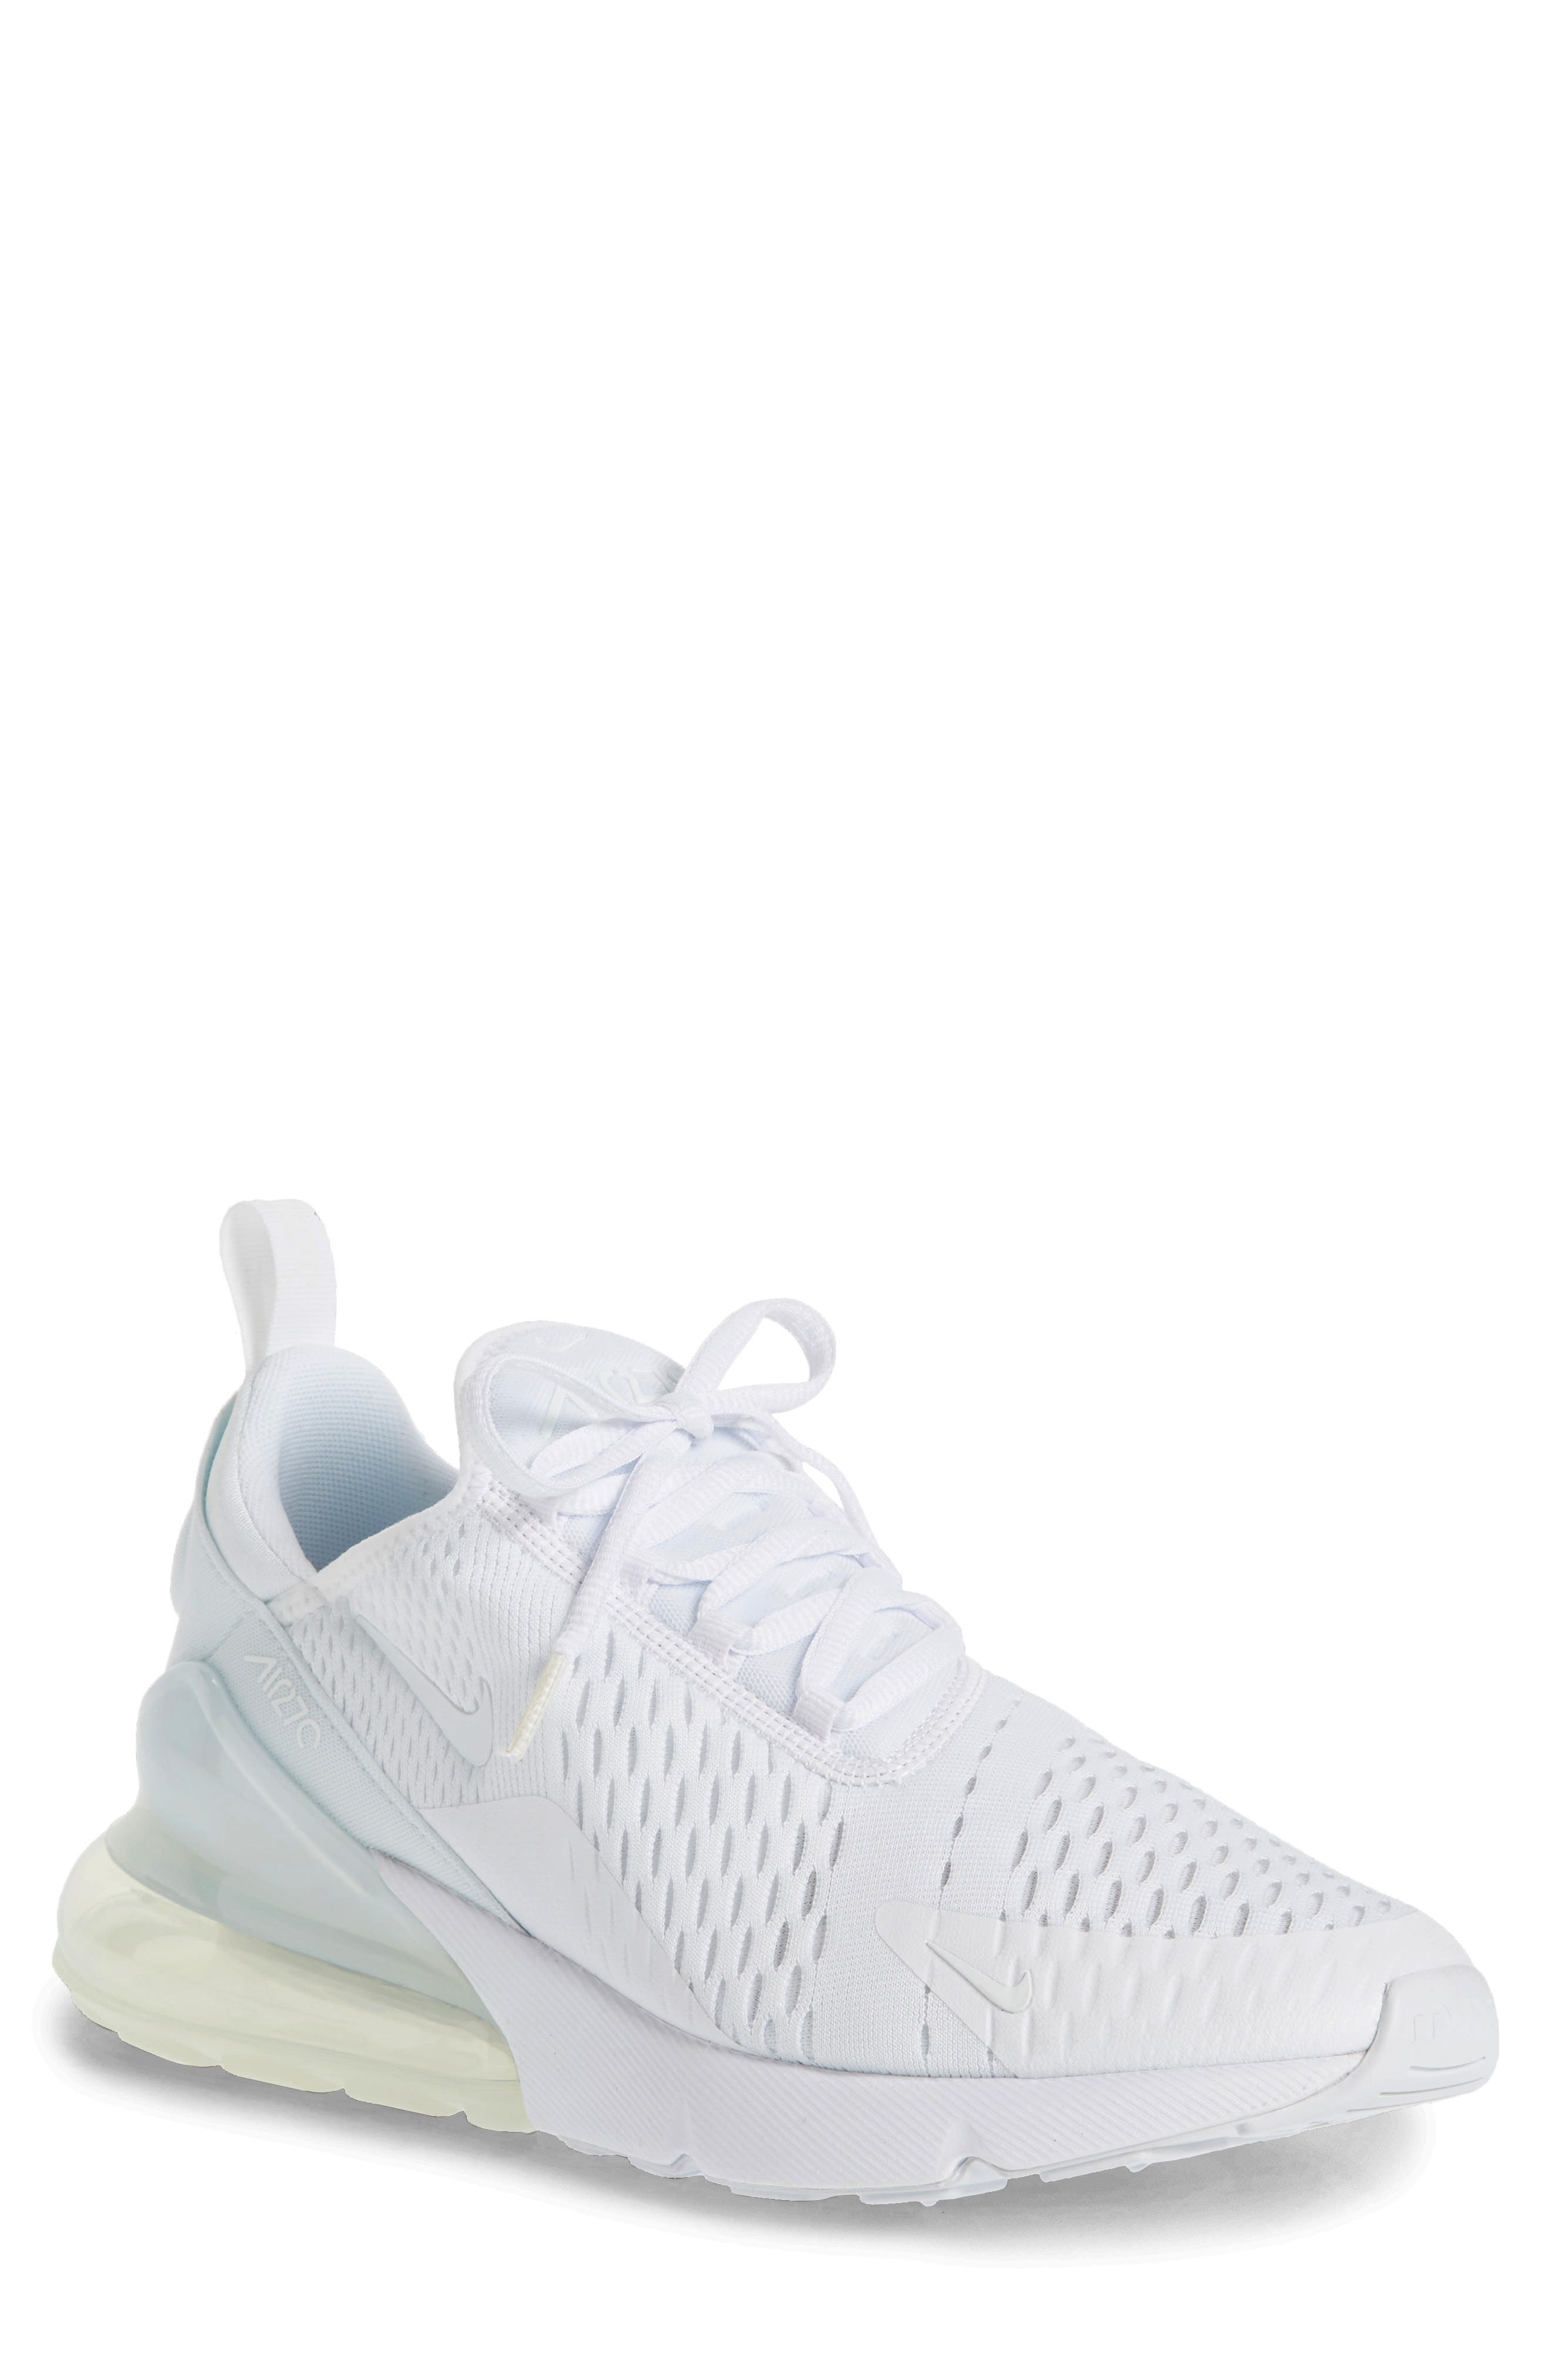 hommes / femmes: la mode des chaussures nordstrom. blanches | nordstrom. chaussures b9952e